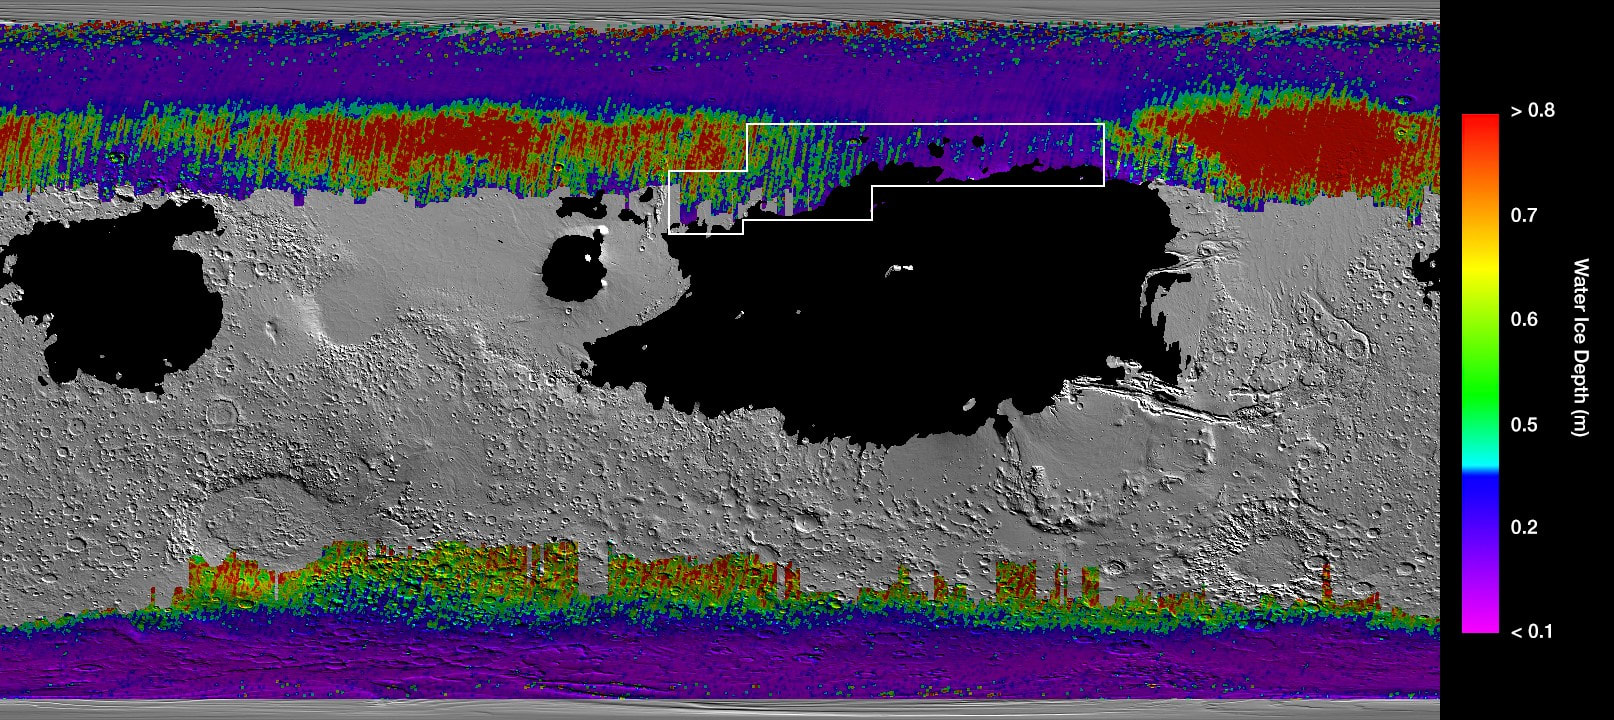 Map of underground water ice on Mars